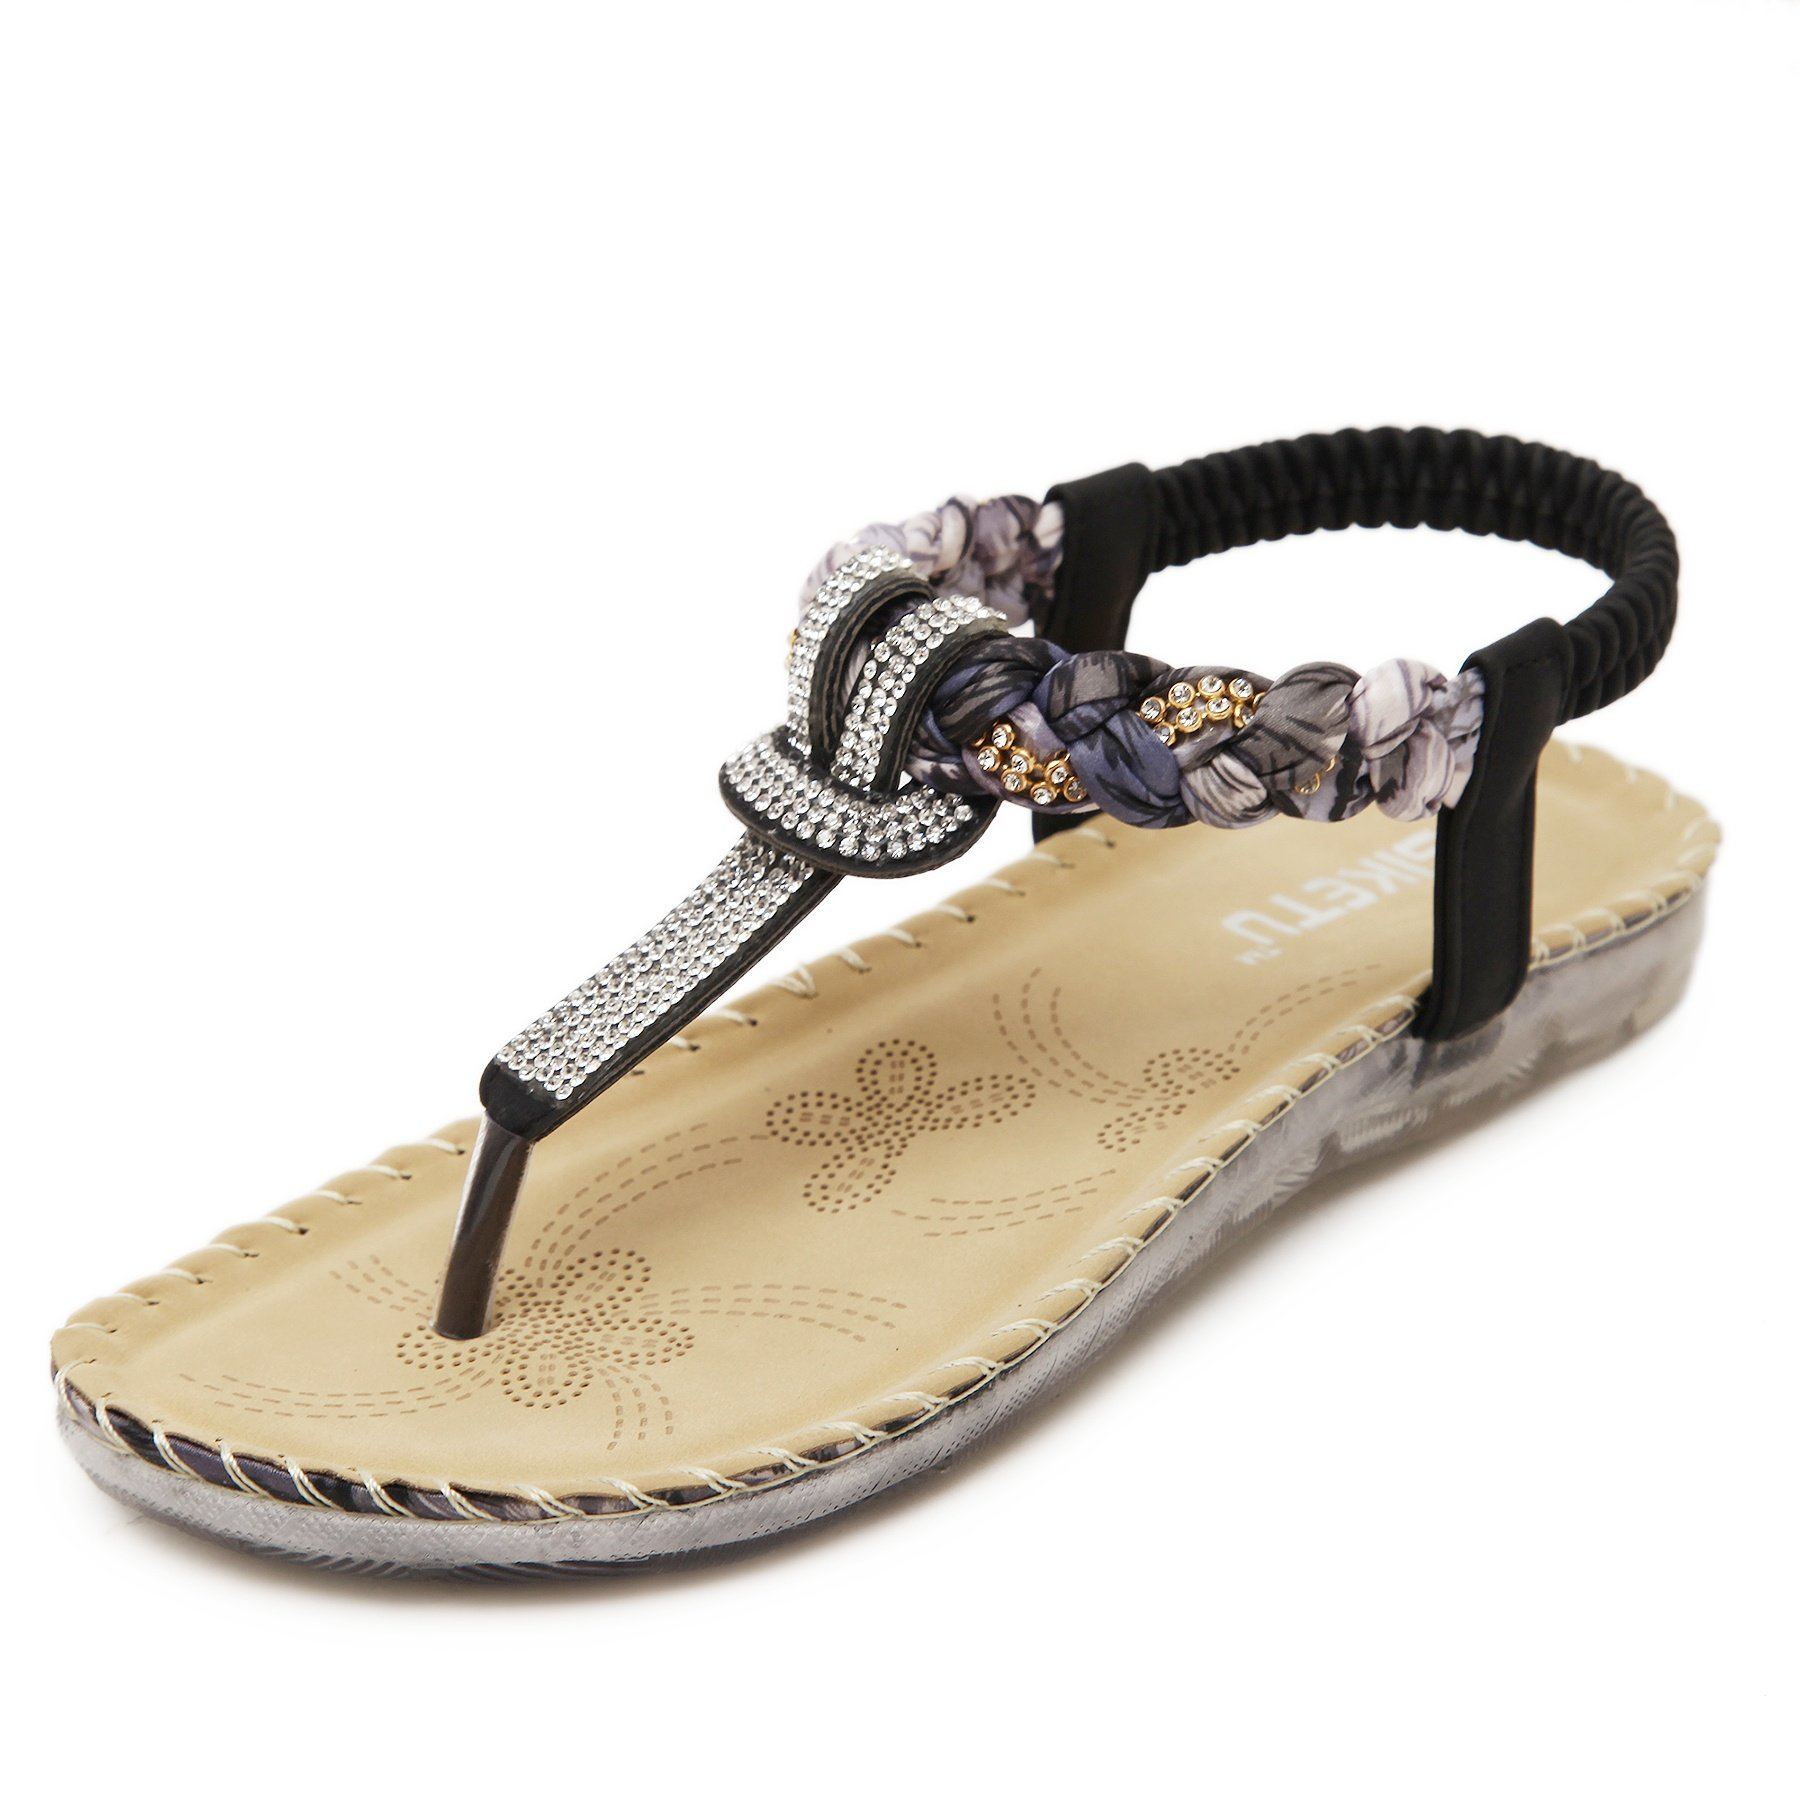 Meeshine Women's Summer Thong Flat Sandals T-Strap Bohemian Rhinestone Slip On Flip Flops Shoes (8 B(M) US, Black 01)